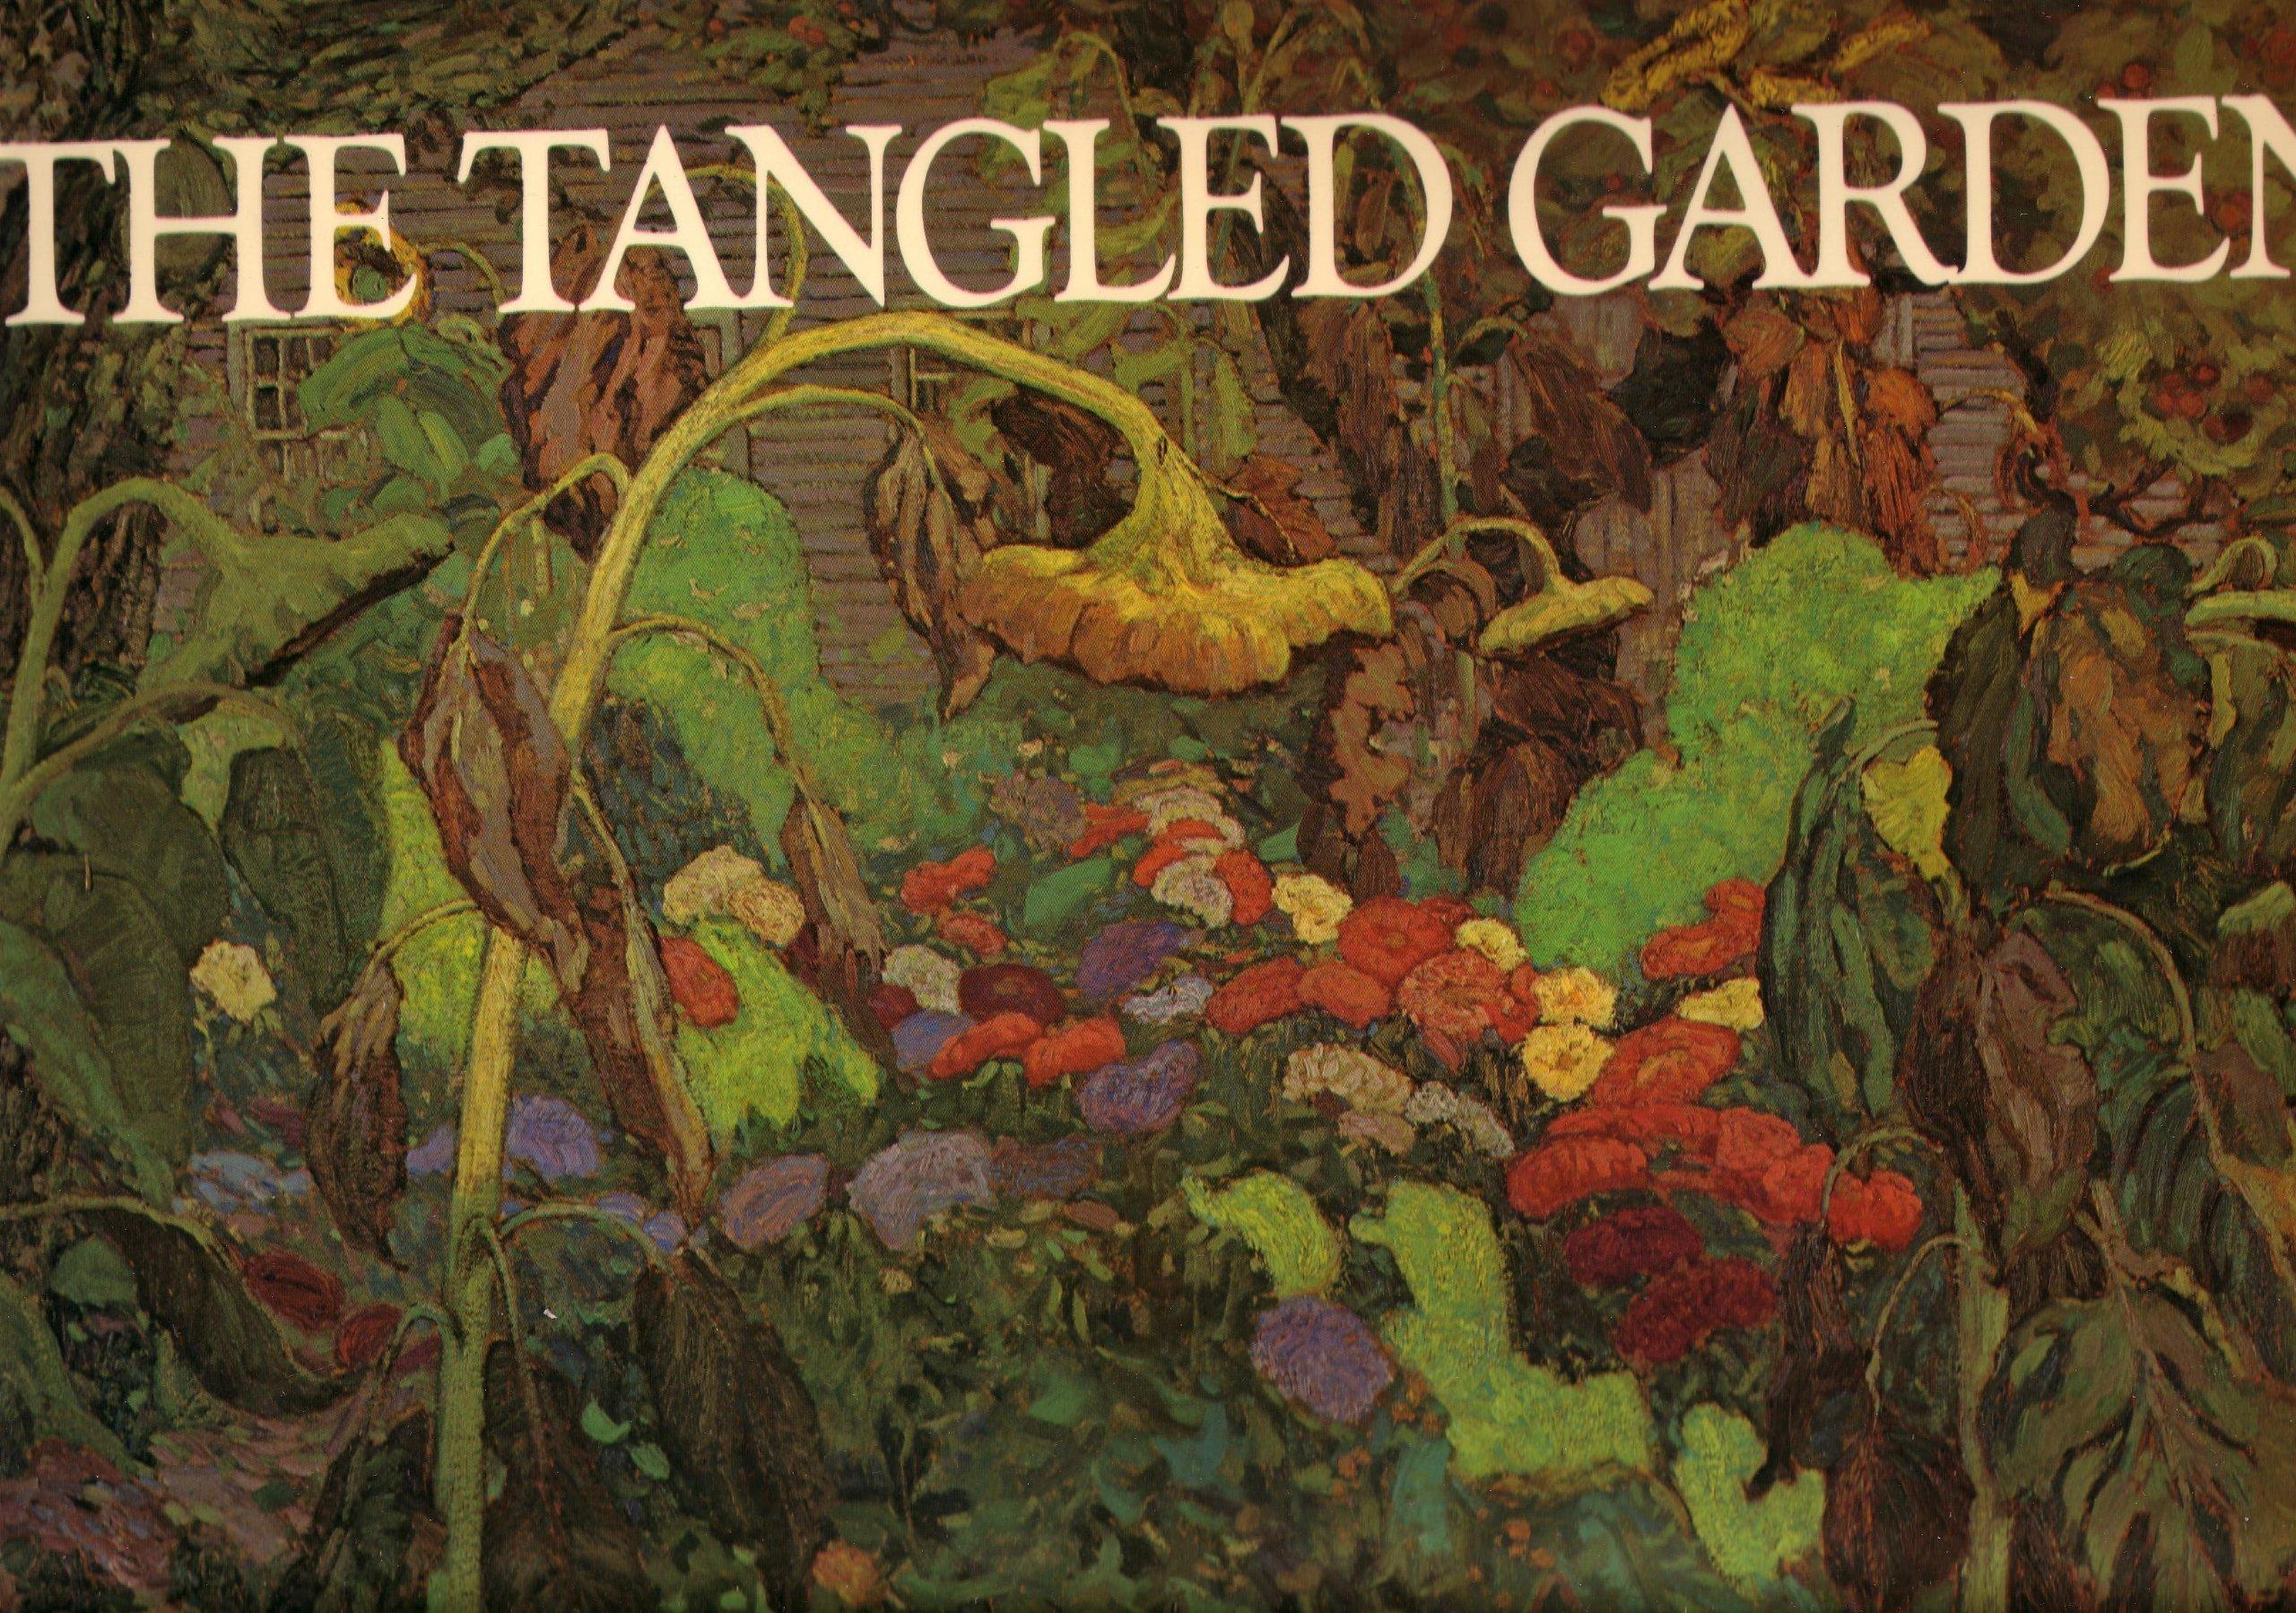 The Tangled Garden The Art Of J E H Macdonald Paul Duval 9780920016084 Amazon Com Books